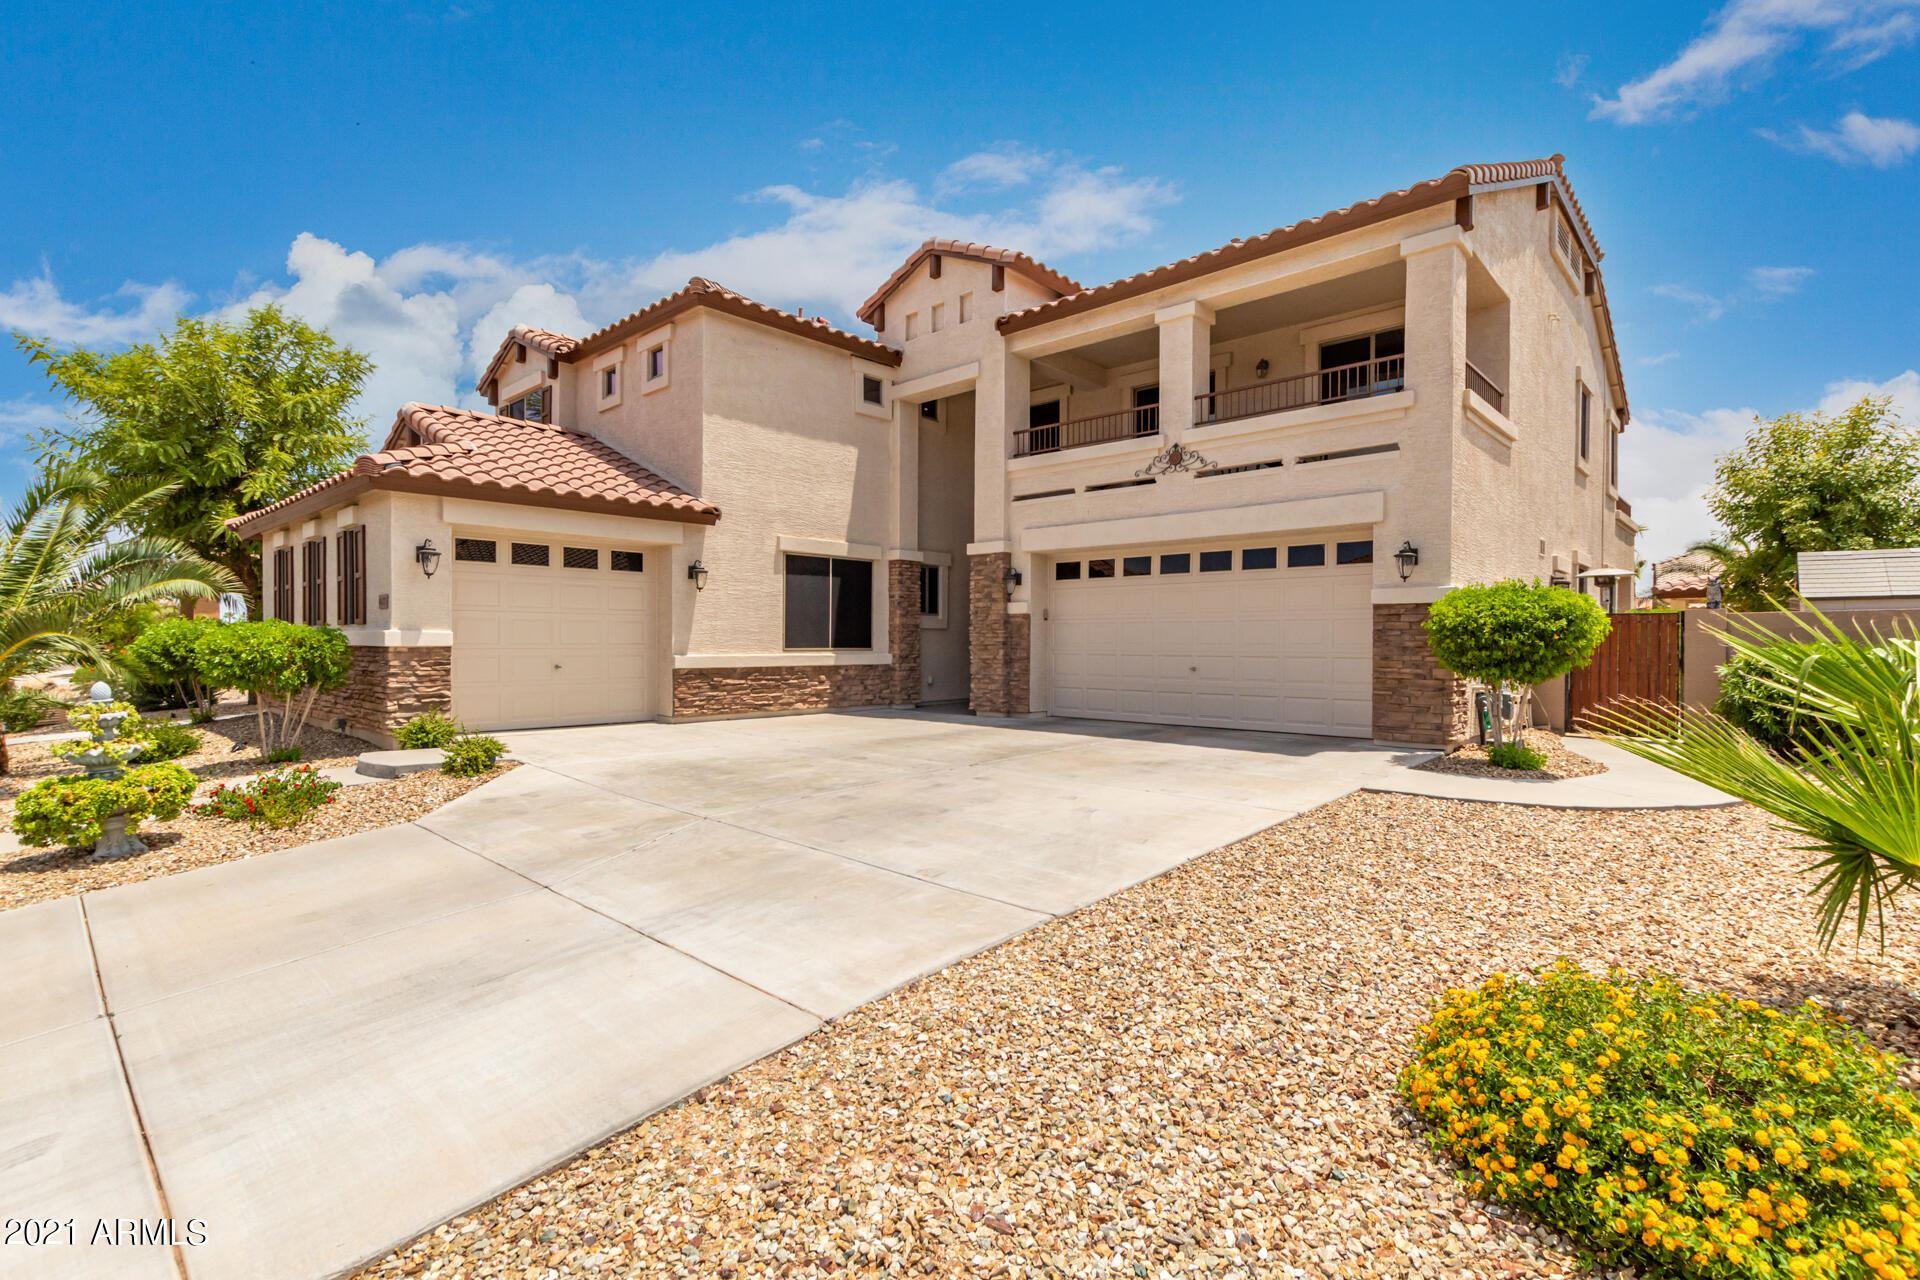 Photo of 41073 W HOPPER Drive, Maricopa, AZ 85138 (MLS # 6267929)